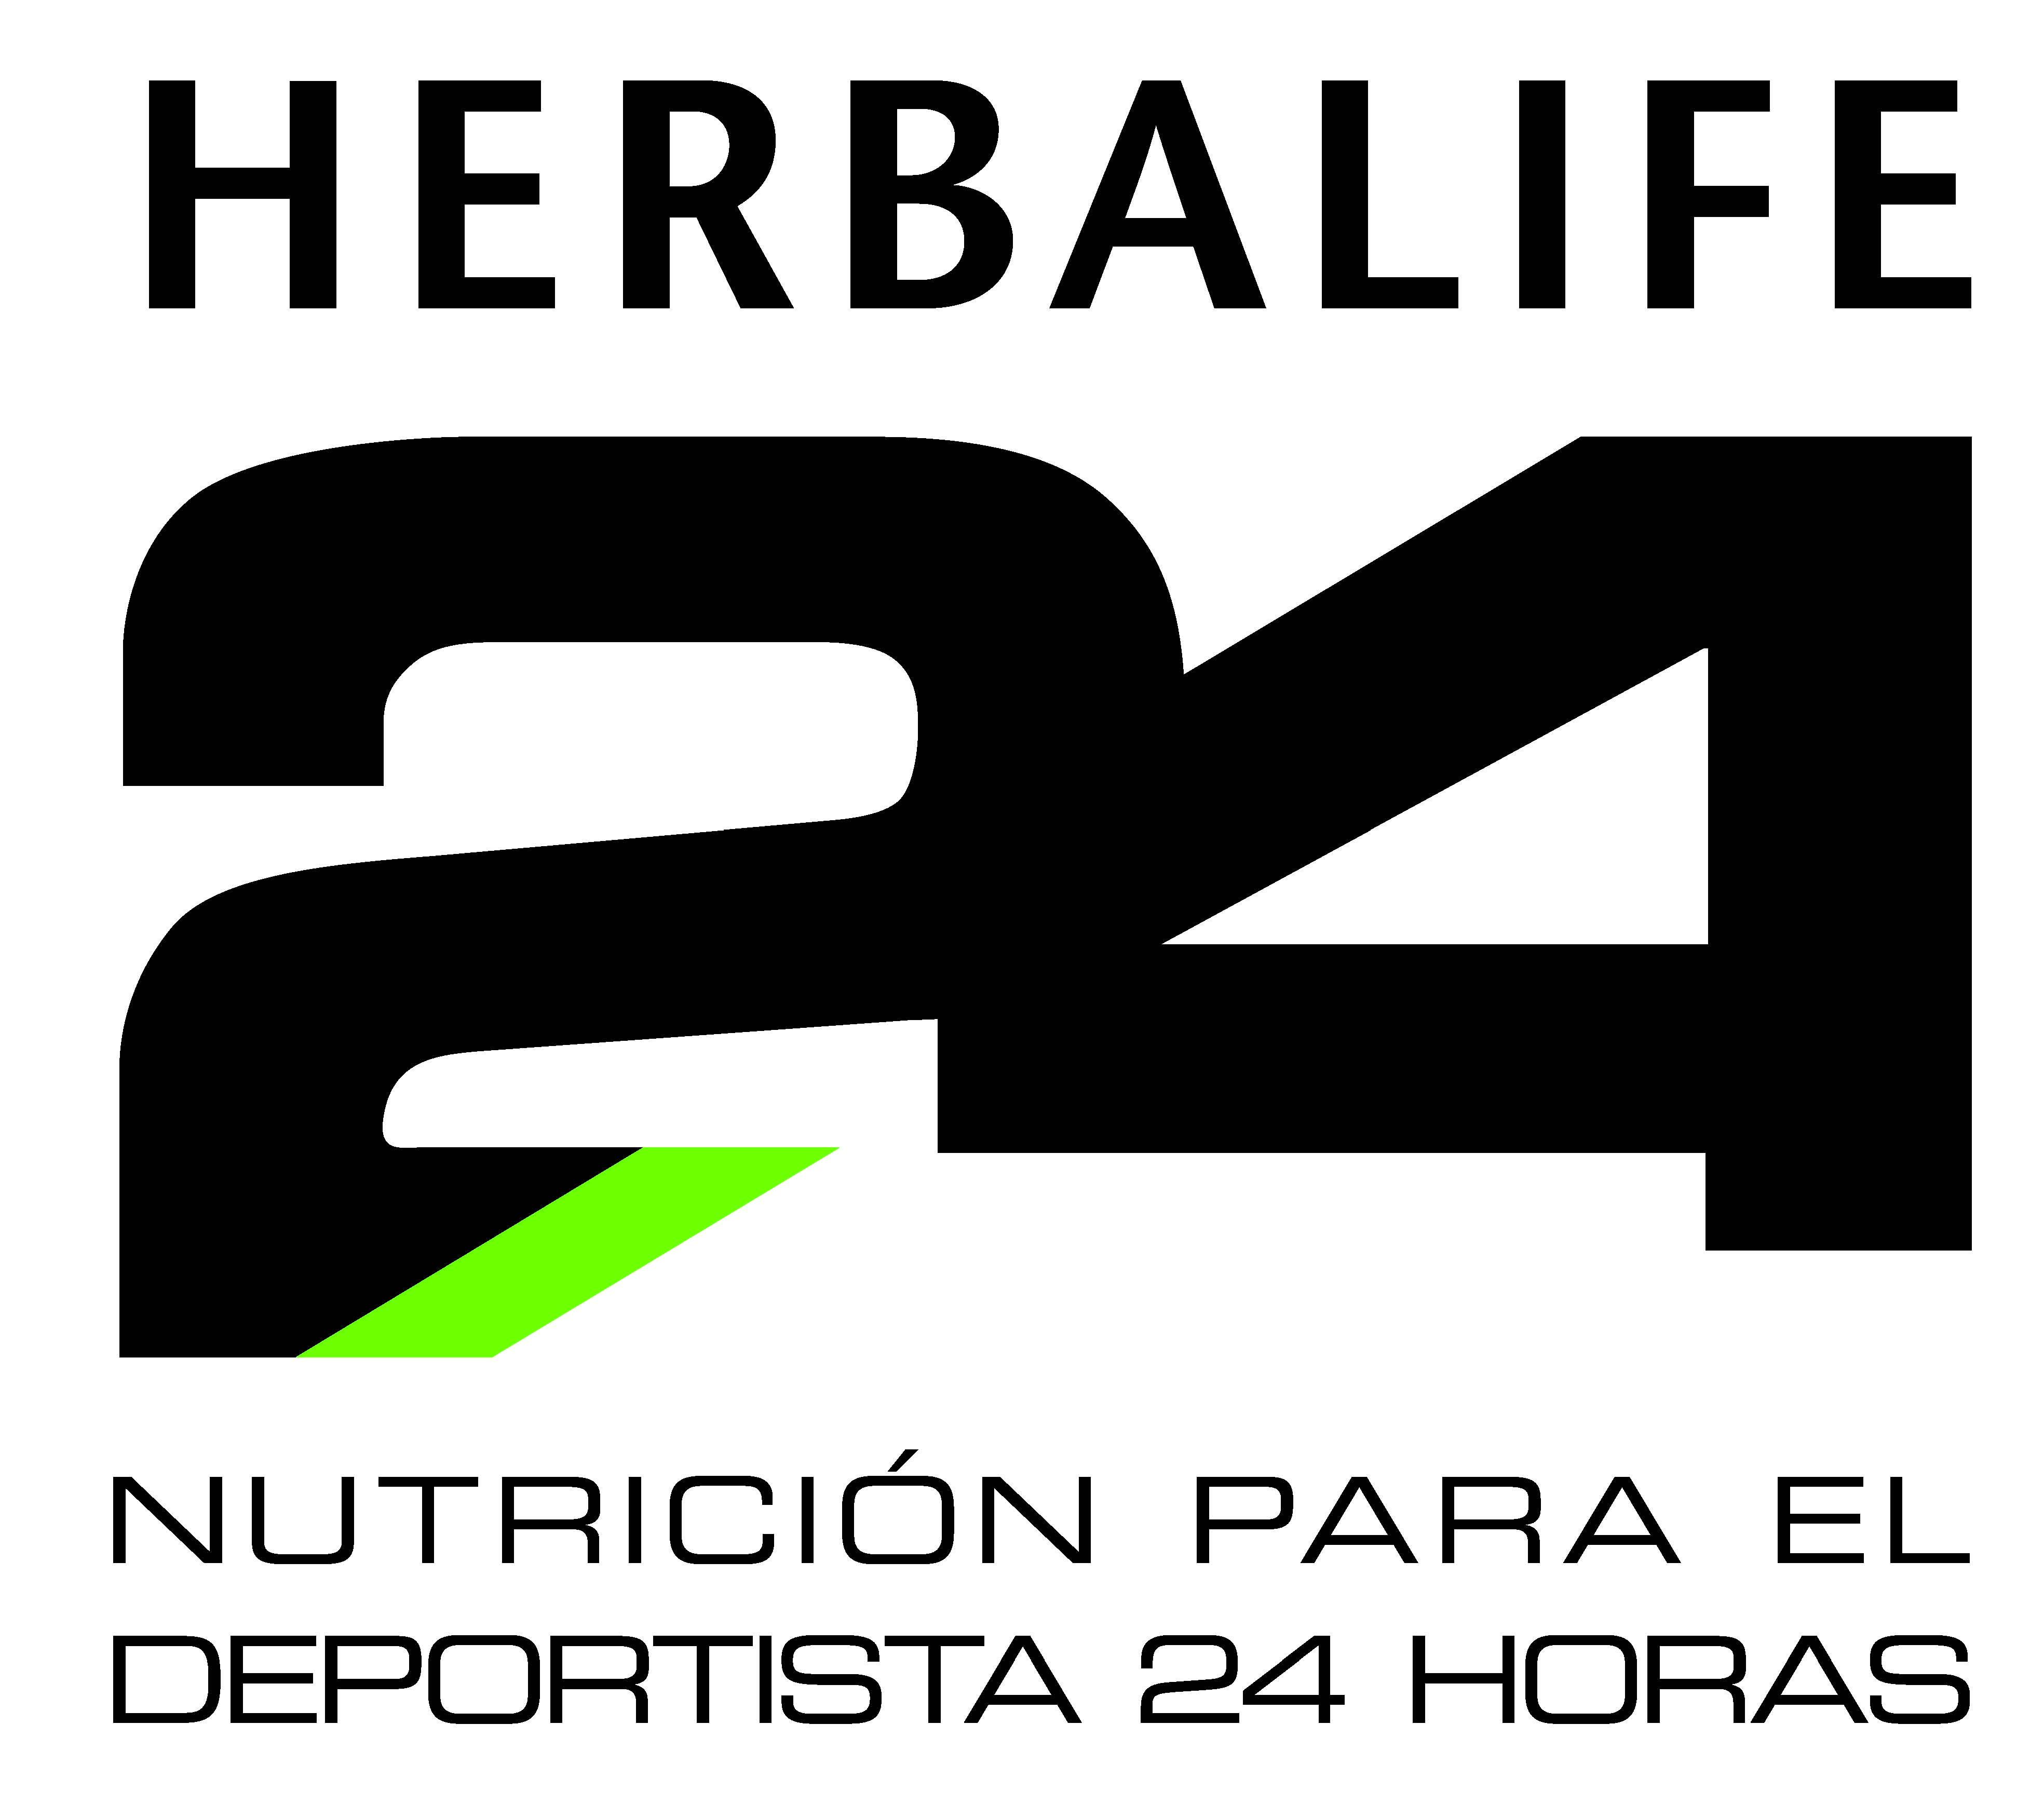 herbalife 24 logos rh logolynx com herbalife 24 logo eps herbalife 24 fit logo